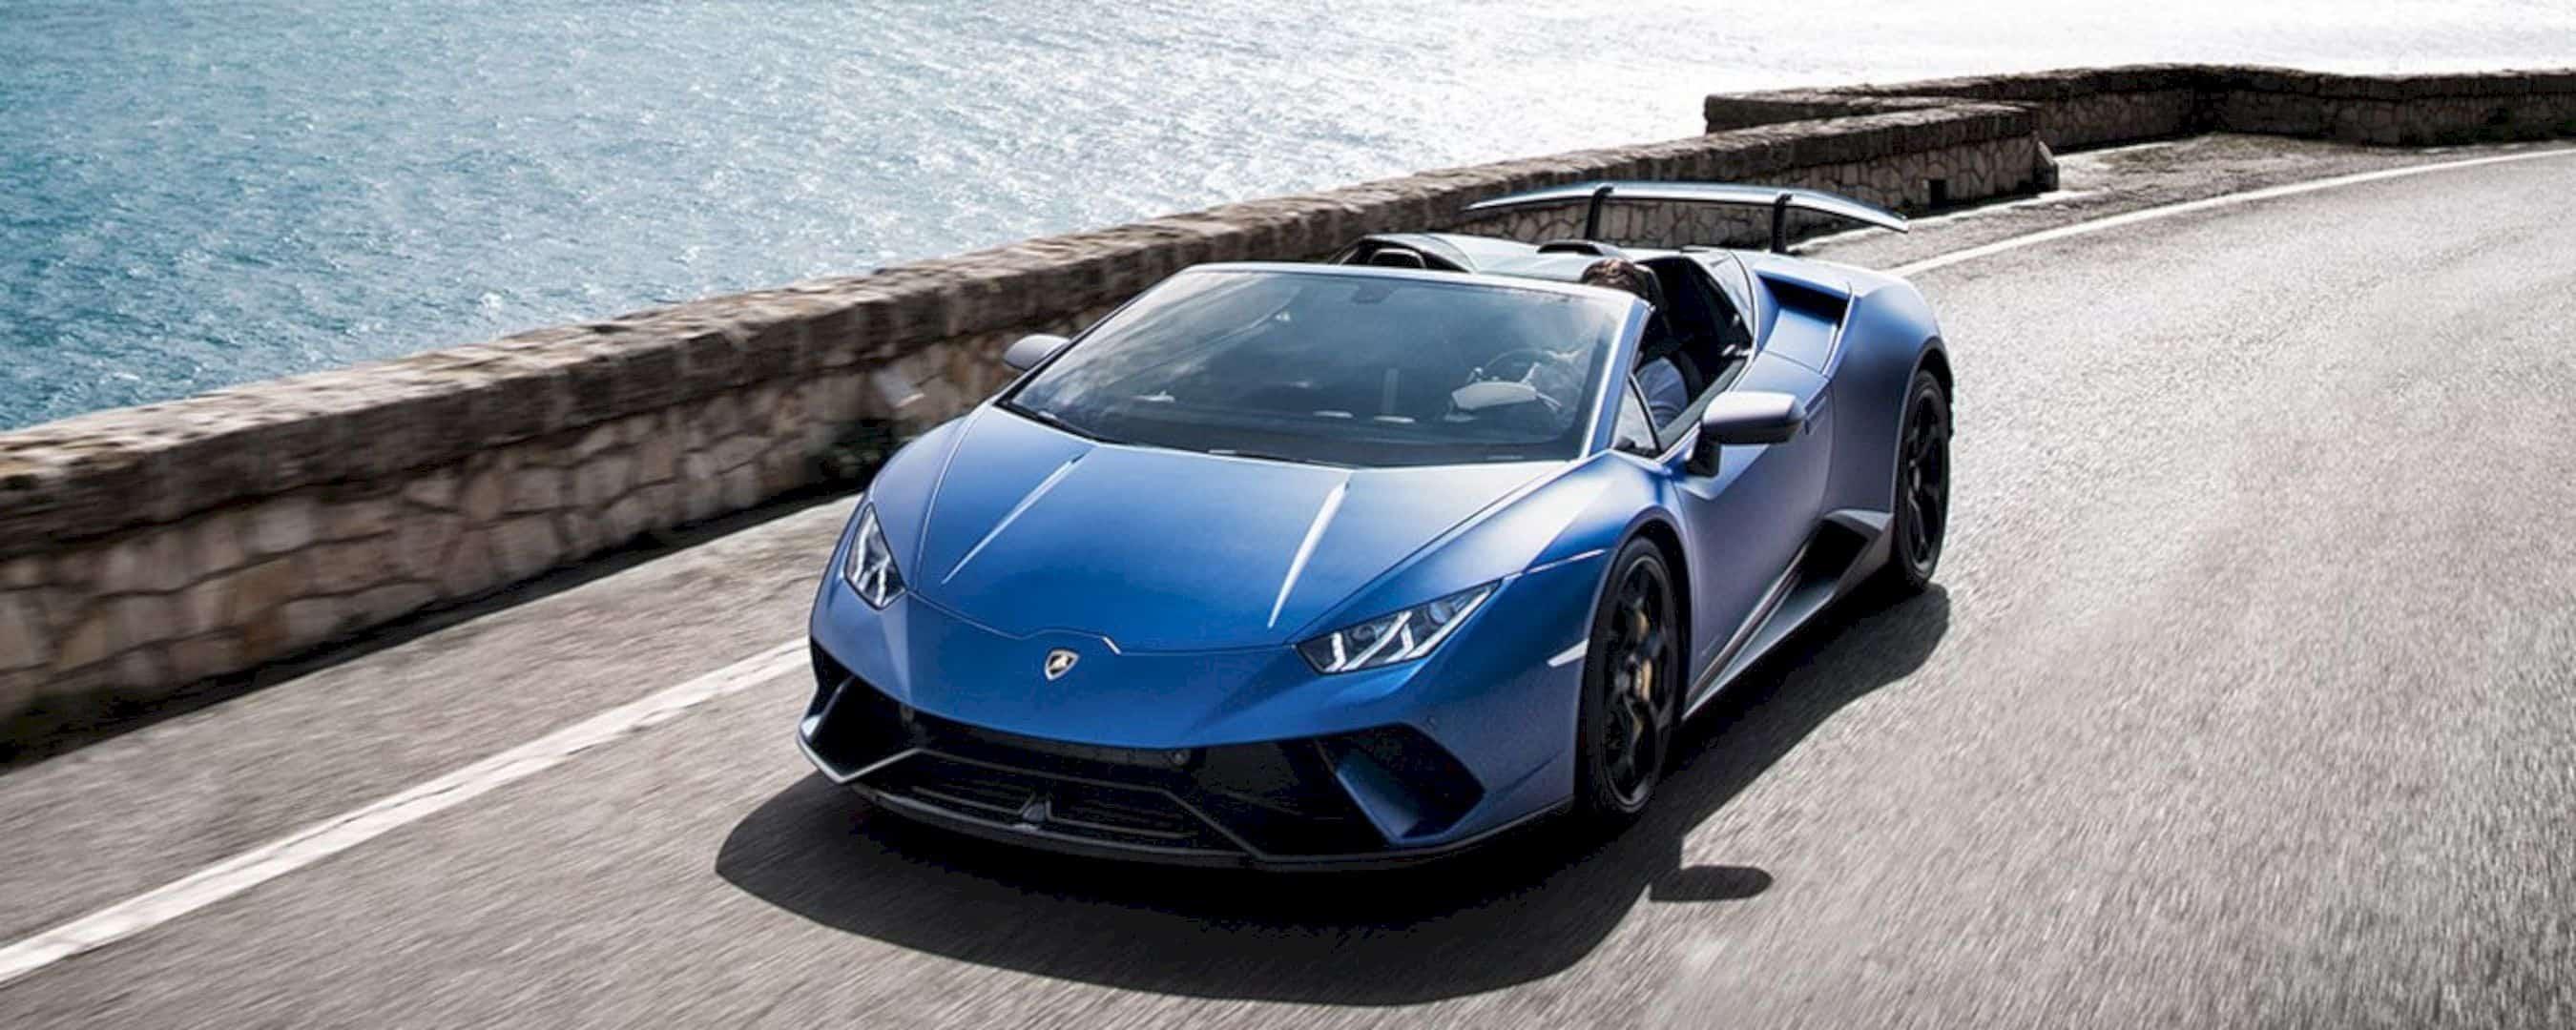 Lamborghini Huracan Performante 4